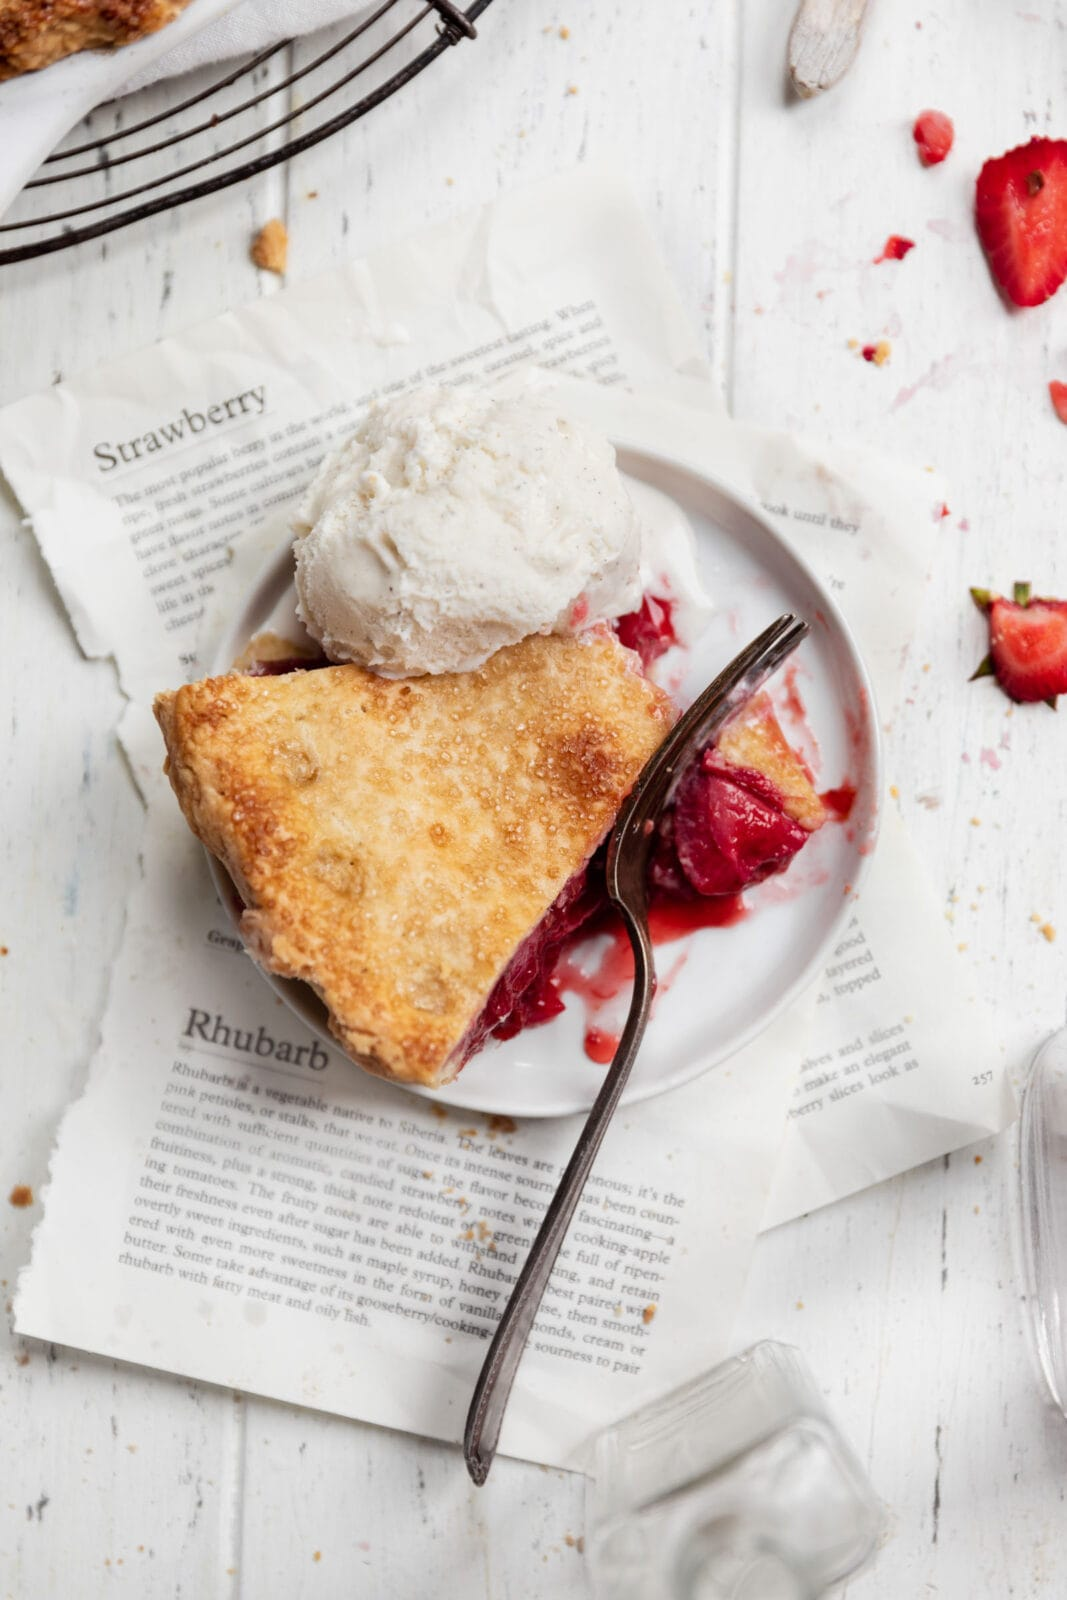 slice of strawberry rhubarb pie with ice cream